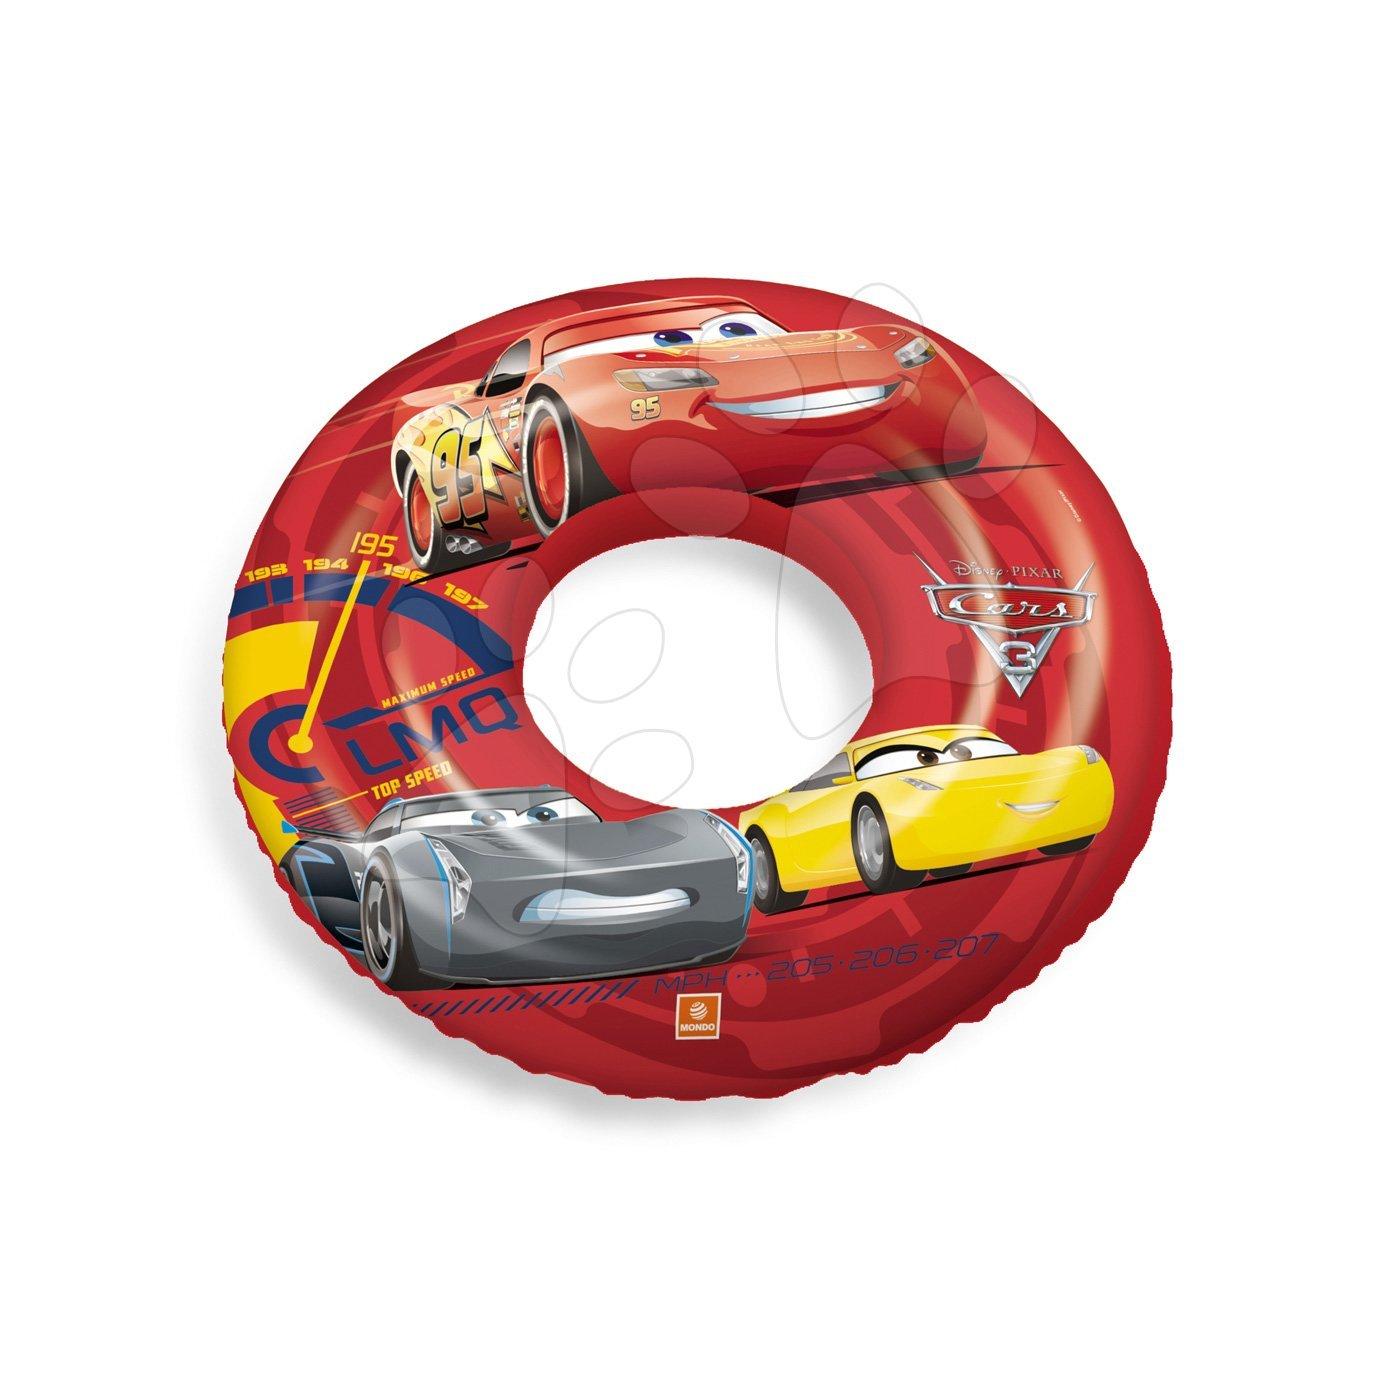 Plavací kruh Auta  Mondo 50 cm od 3 let